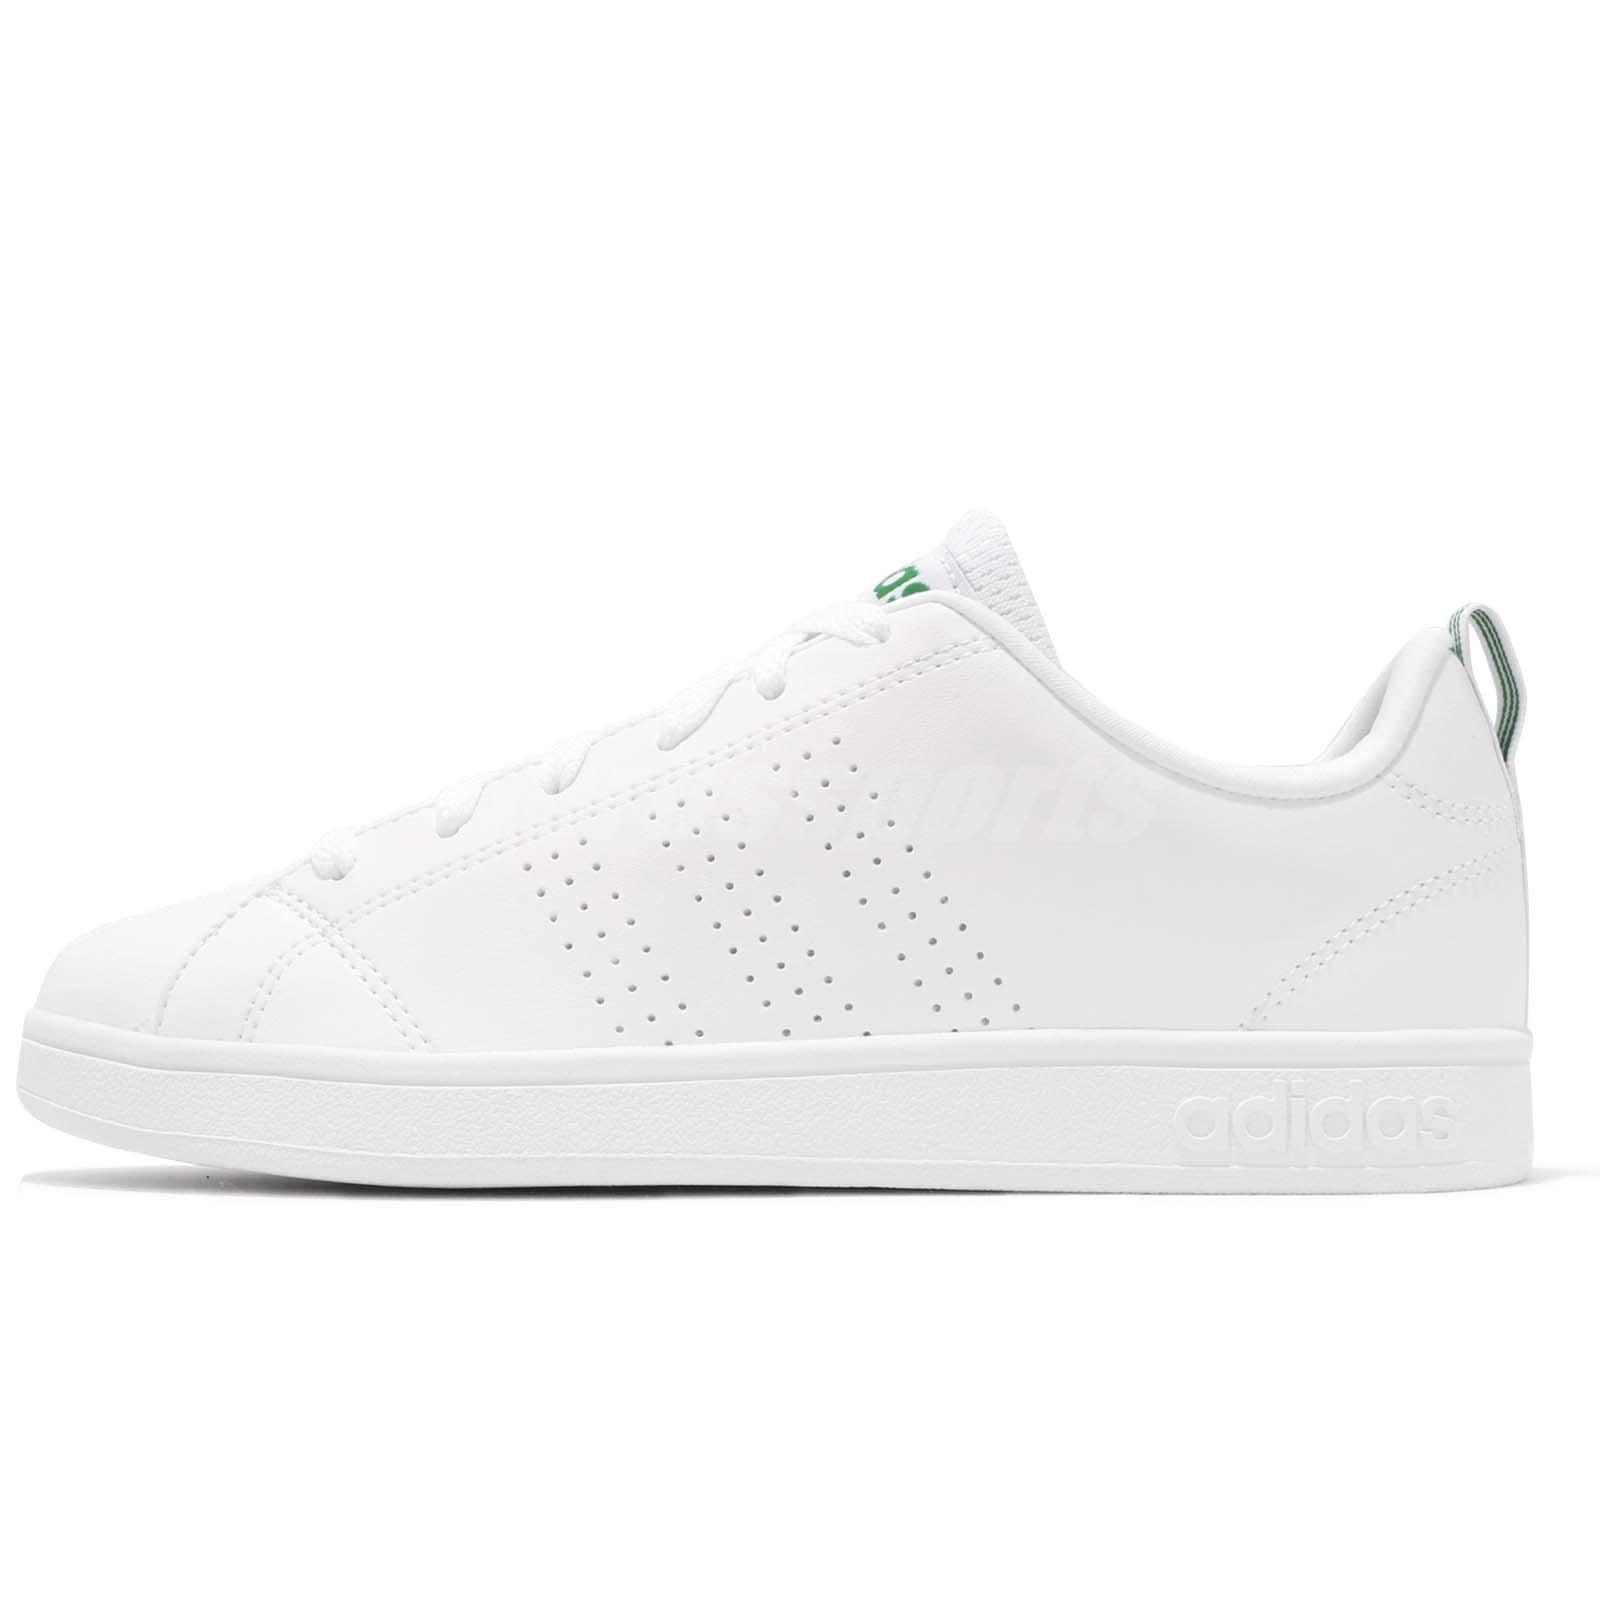 Adidas Neo Label Advantage